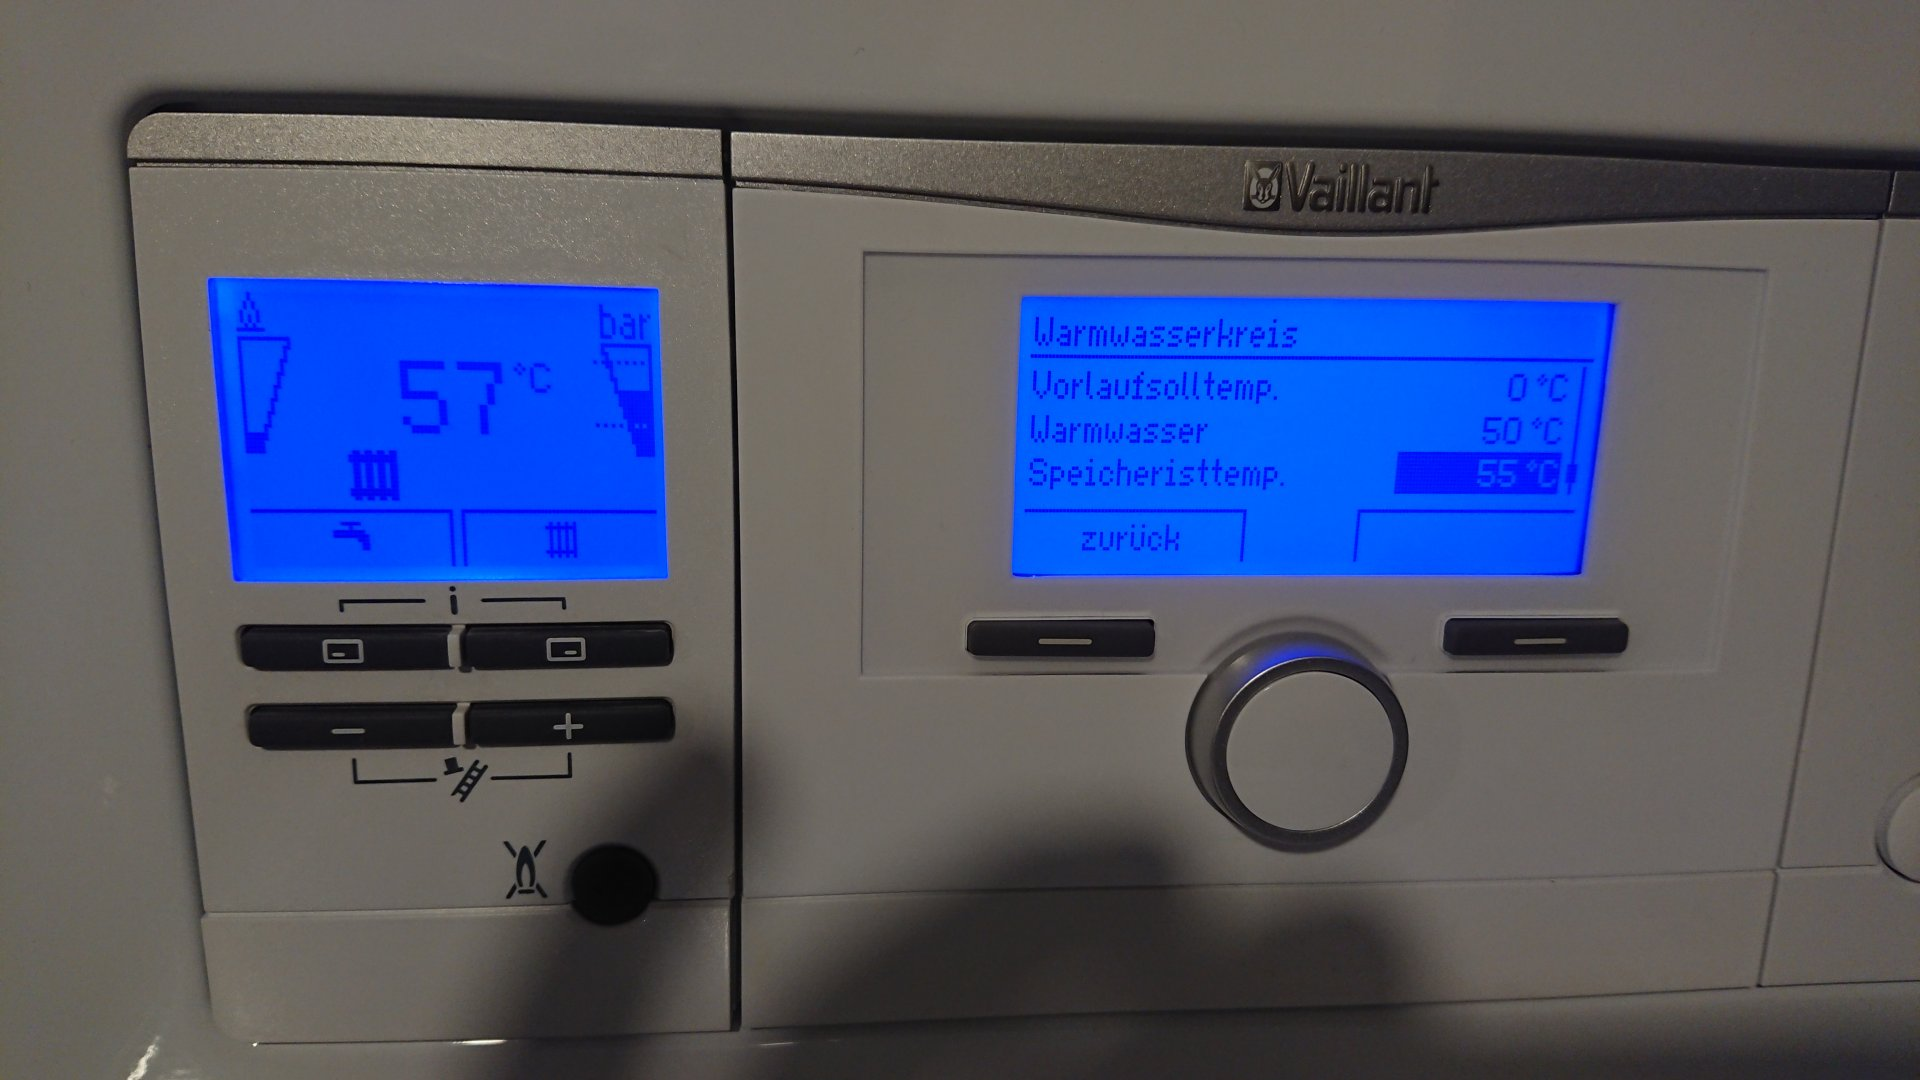 Vaillant Ecotec Plus Vc 2065 5 Vr 70 Vrc 700 Austria Psr 800